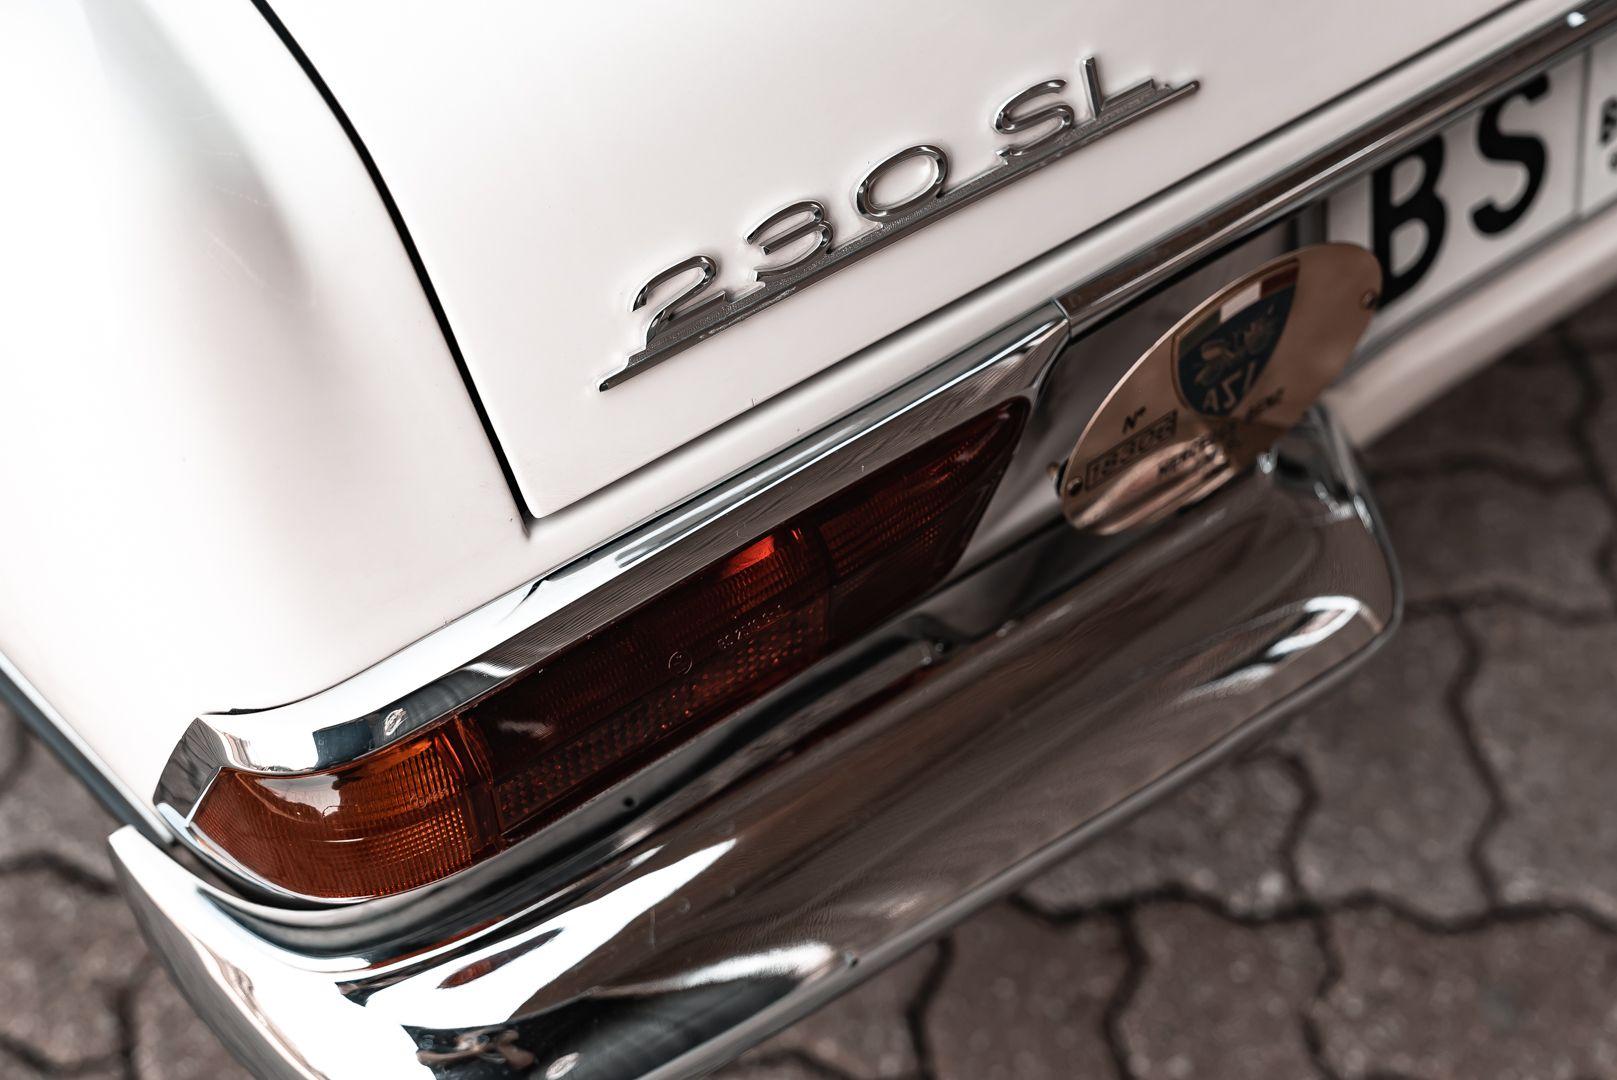 1965 Mercedes-Benz SL230 Pagoda 78533